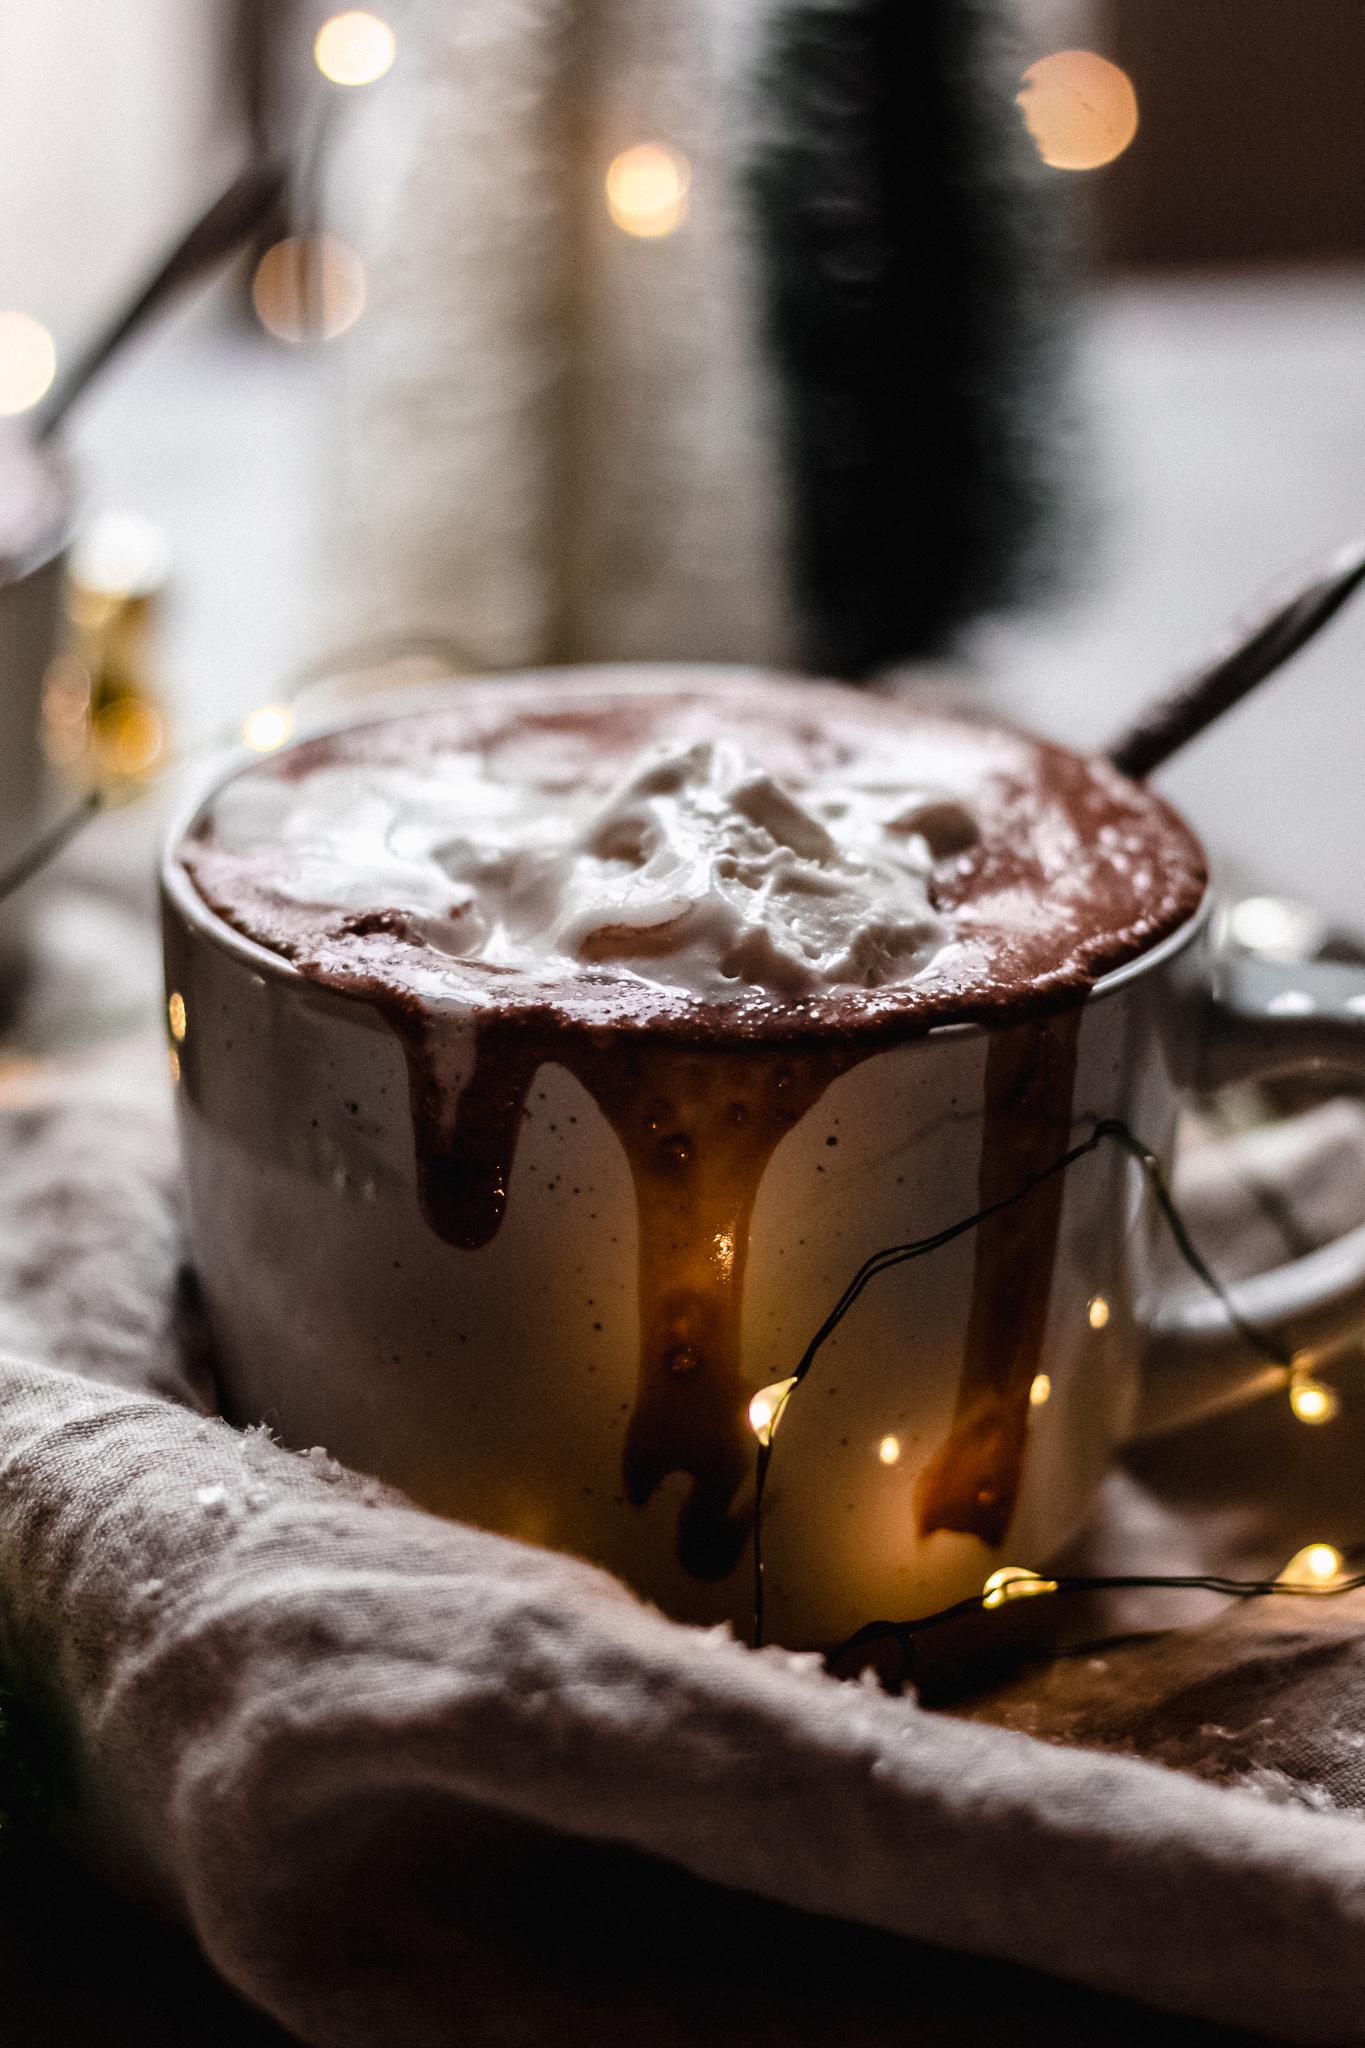 Receita Noiva Ansiosa Chocolate Quente Cremoso Dicas de Inverno